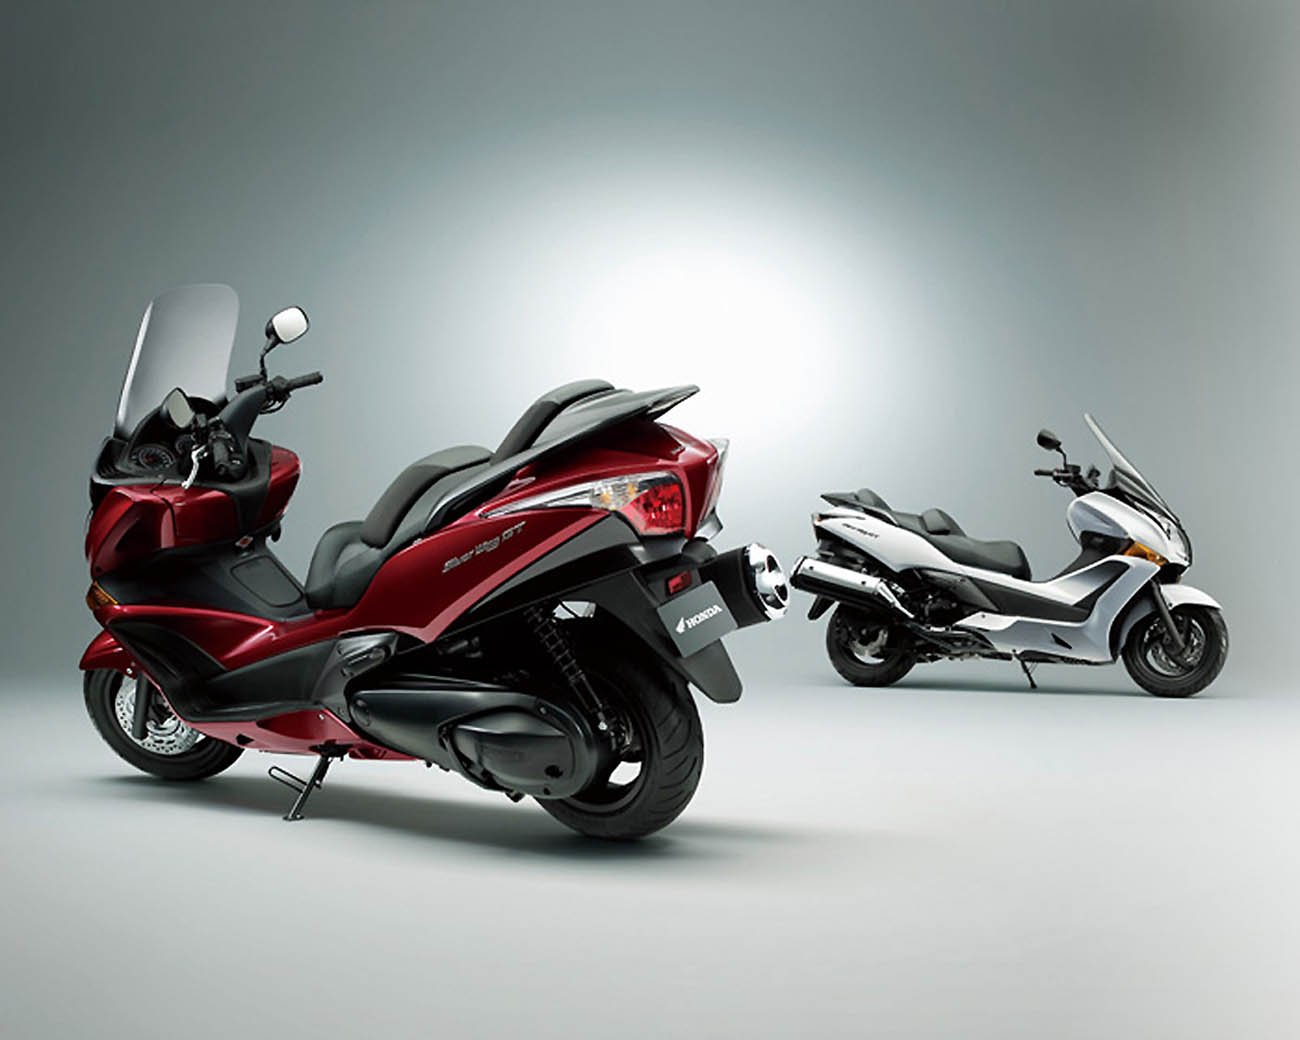 honda silverwing gt 600 best motorcycle wallpaper. Black Bedroom Furniture Sets. Home Design Ideas